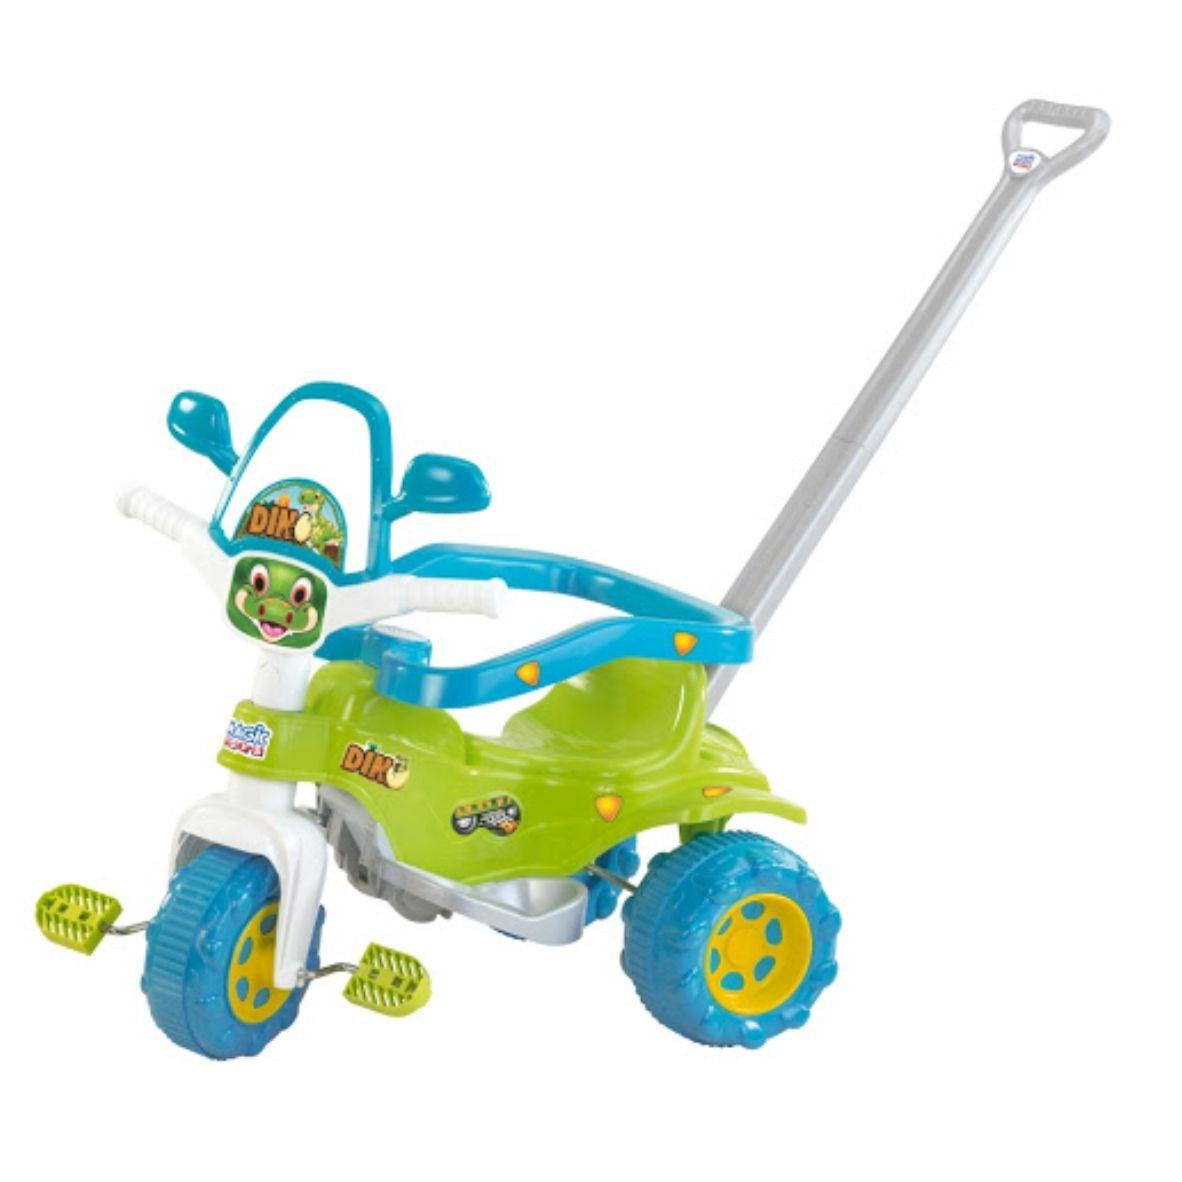 Triciclo Tico Tico Dino Verde - Magic Toys